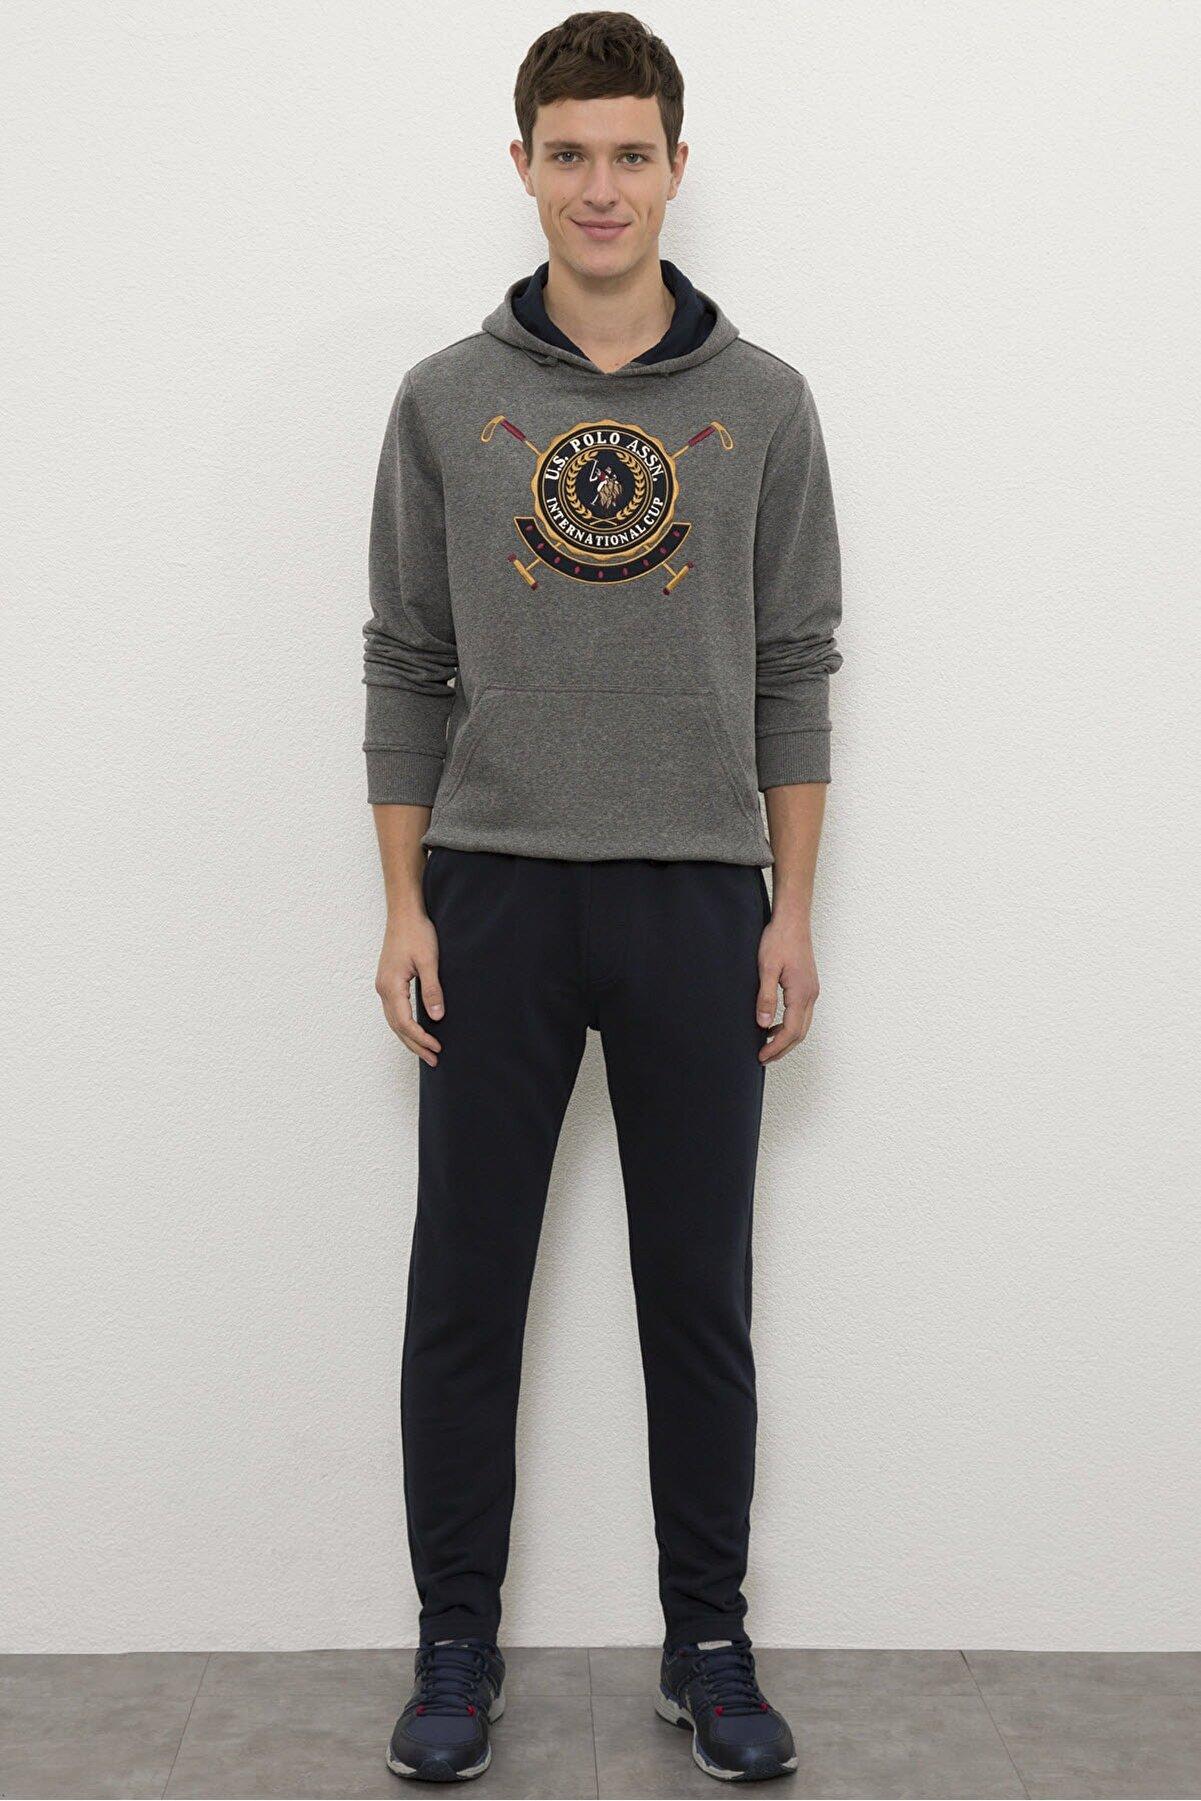 US Polo Assn Lacıvert Erkek Örme Pantolon